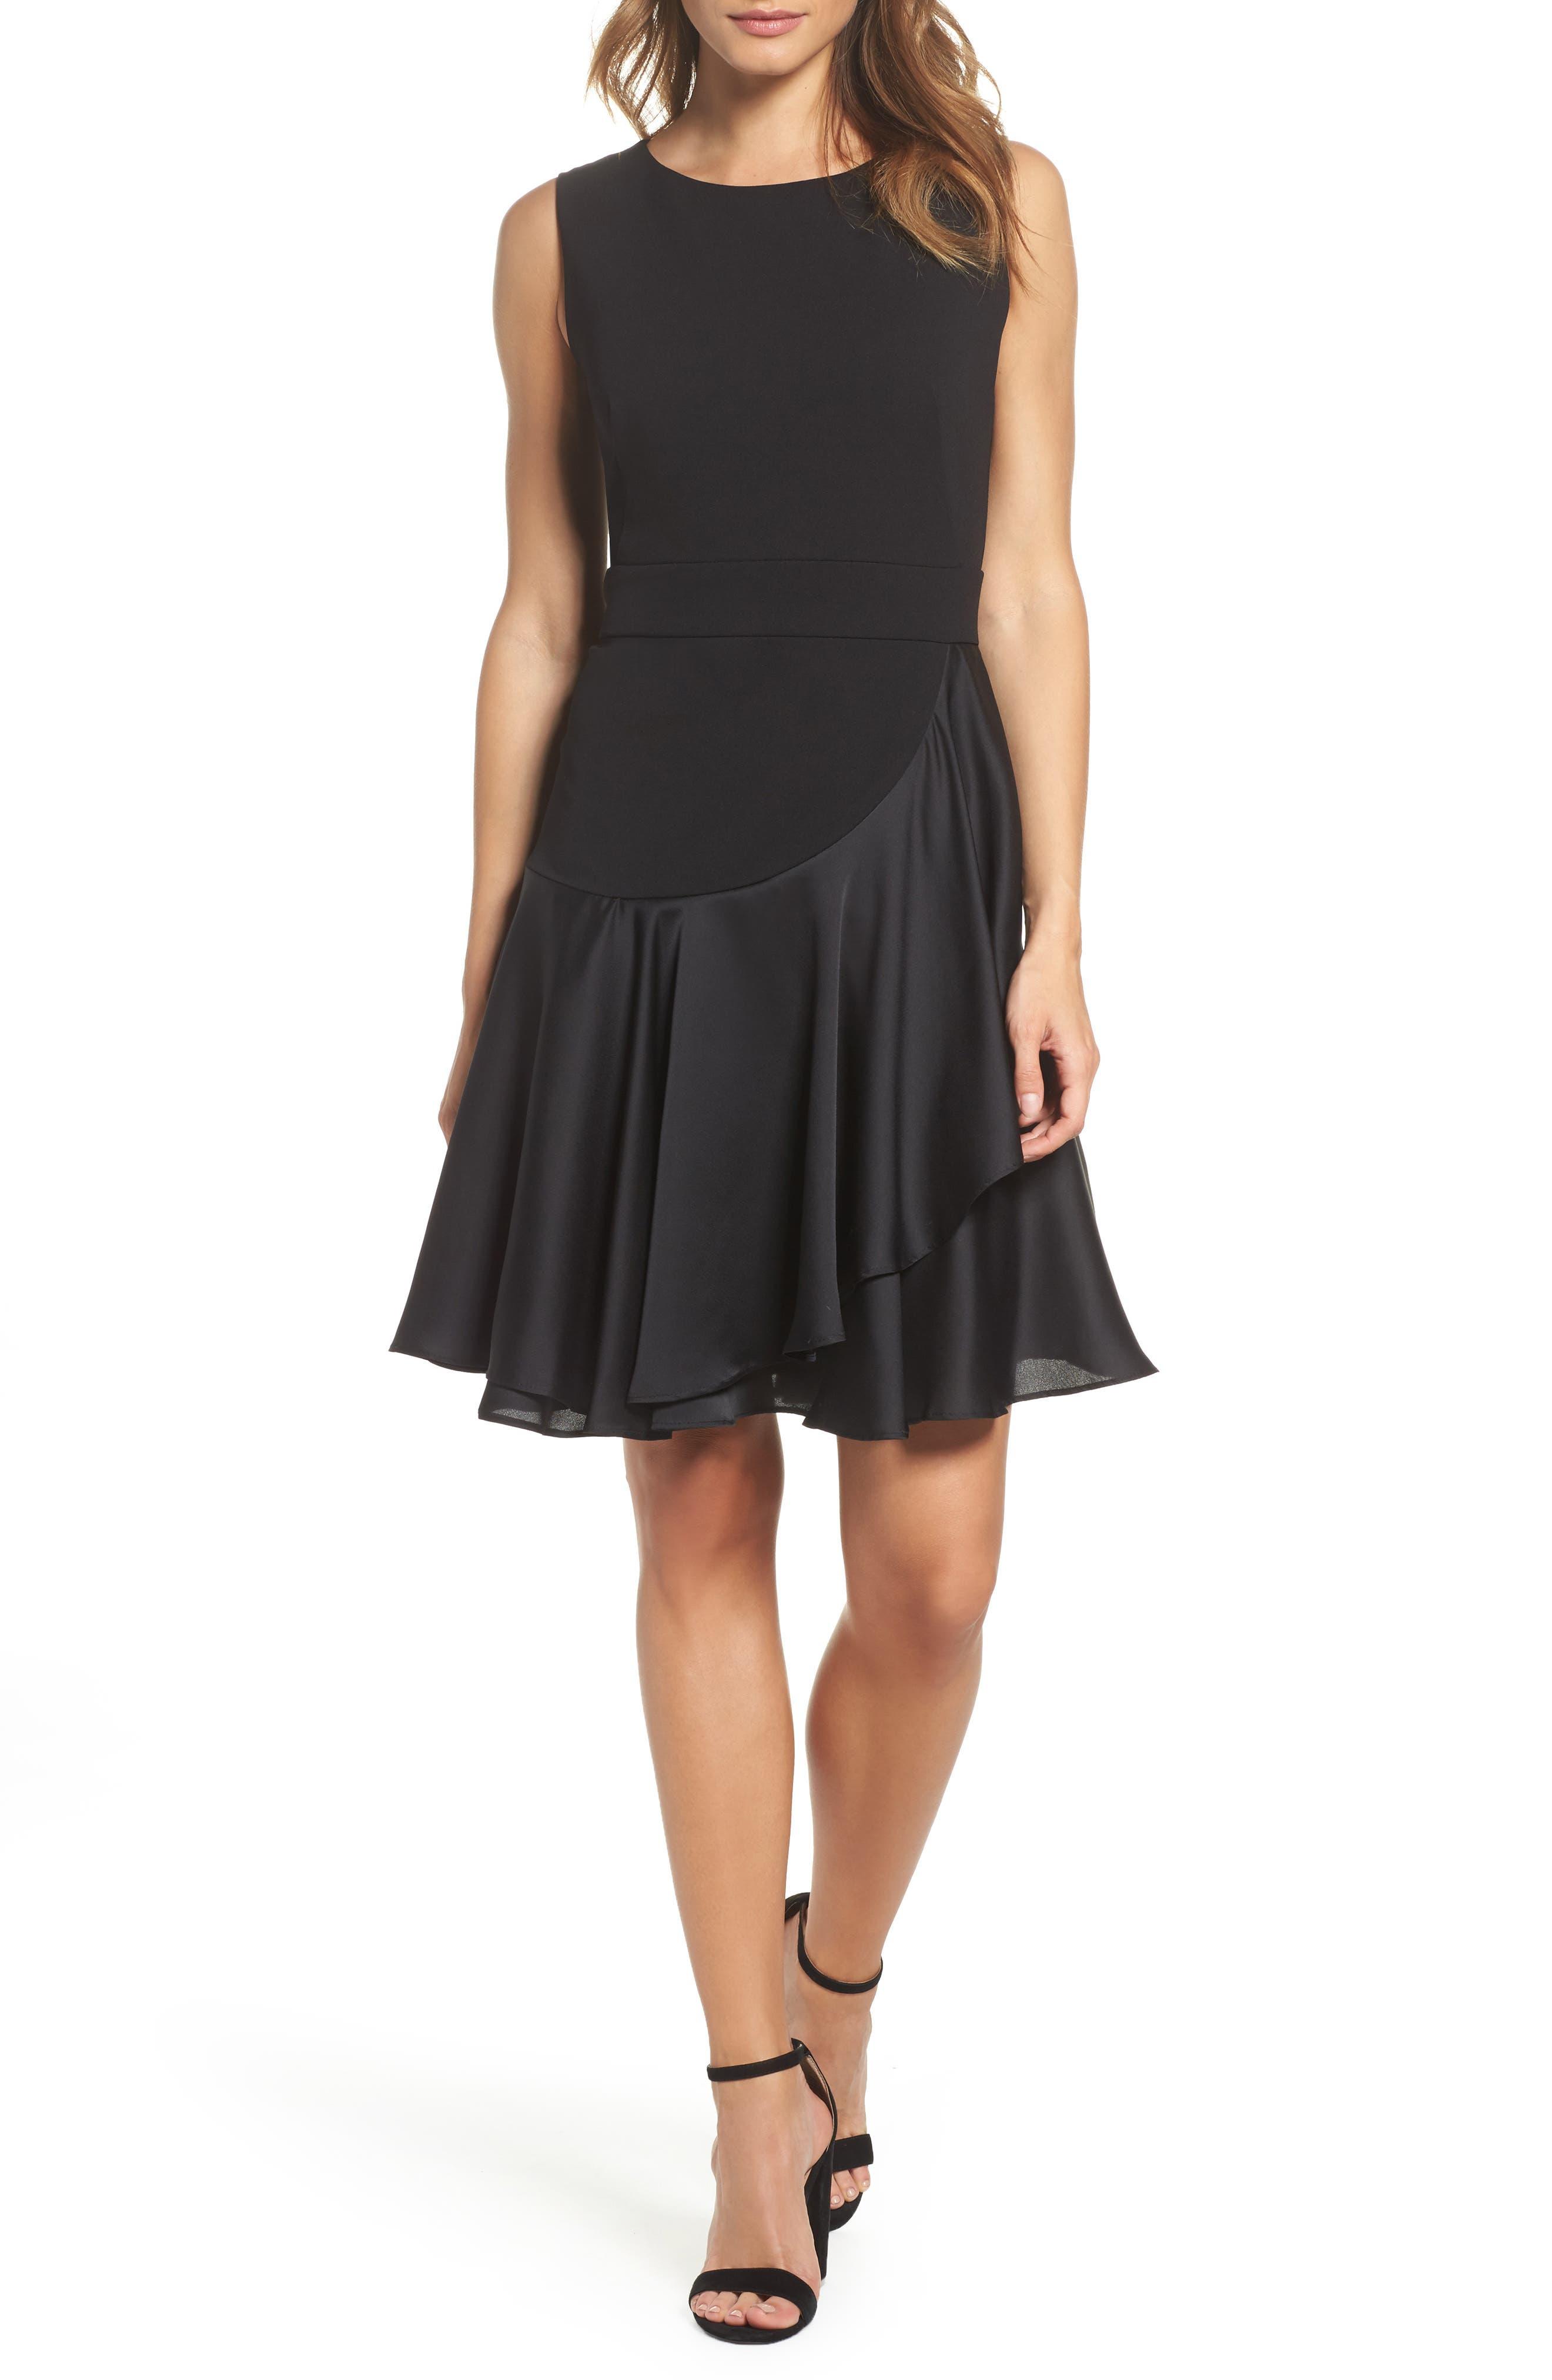 Taylor Dresses Ruffle Hem Fit & Flare Dress